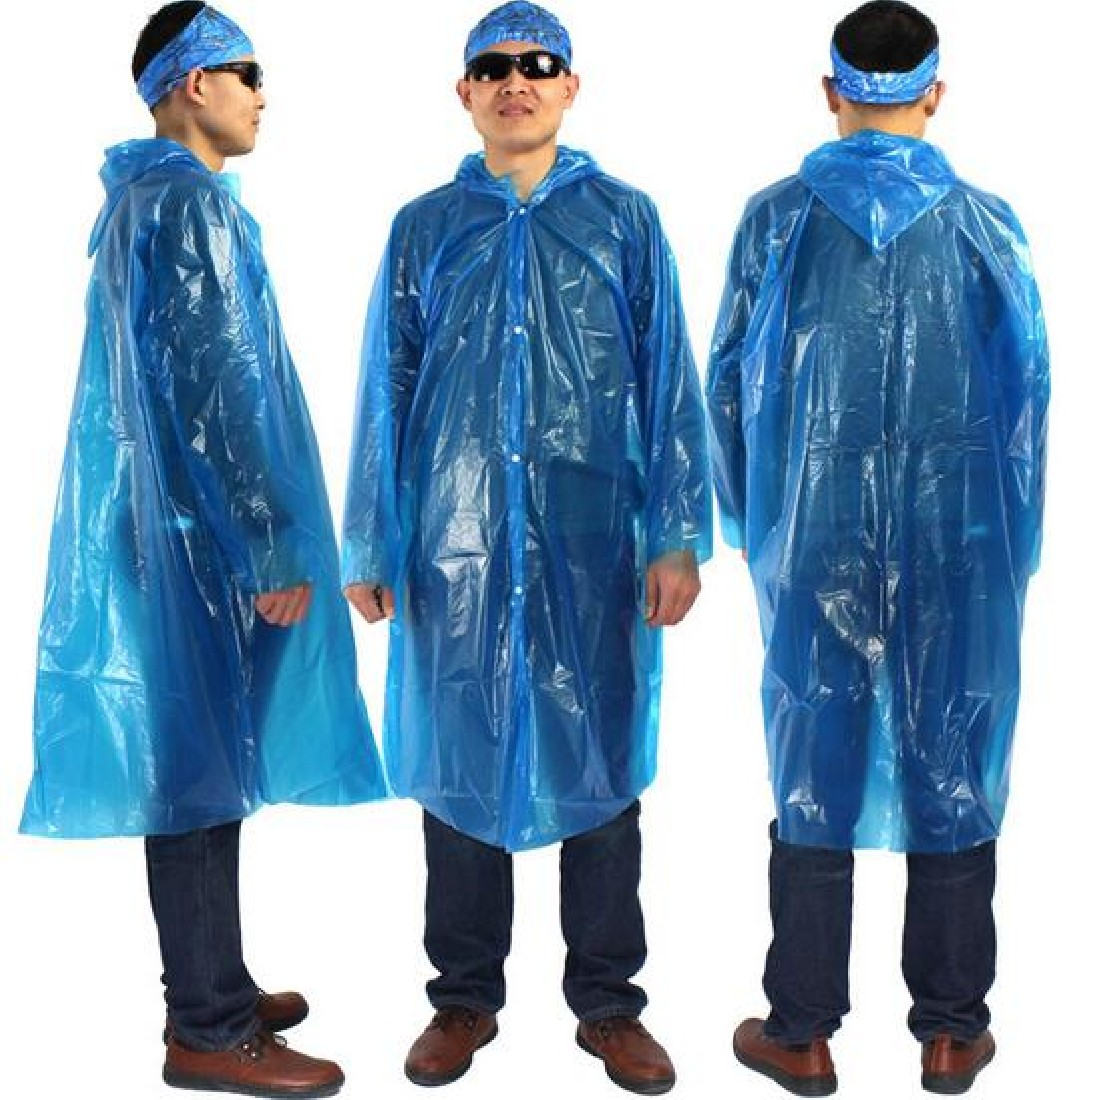 Outdoor rain jacket Travel Camping Emergency Disposable Raincoat Adult Unisex One-off Waterproof Raincoats Hood Random Color